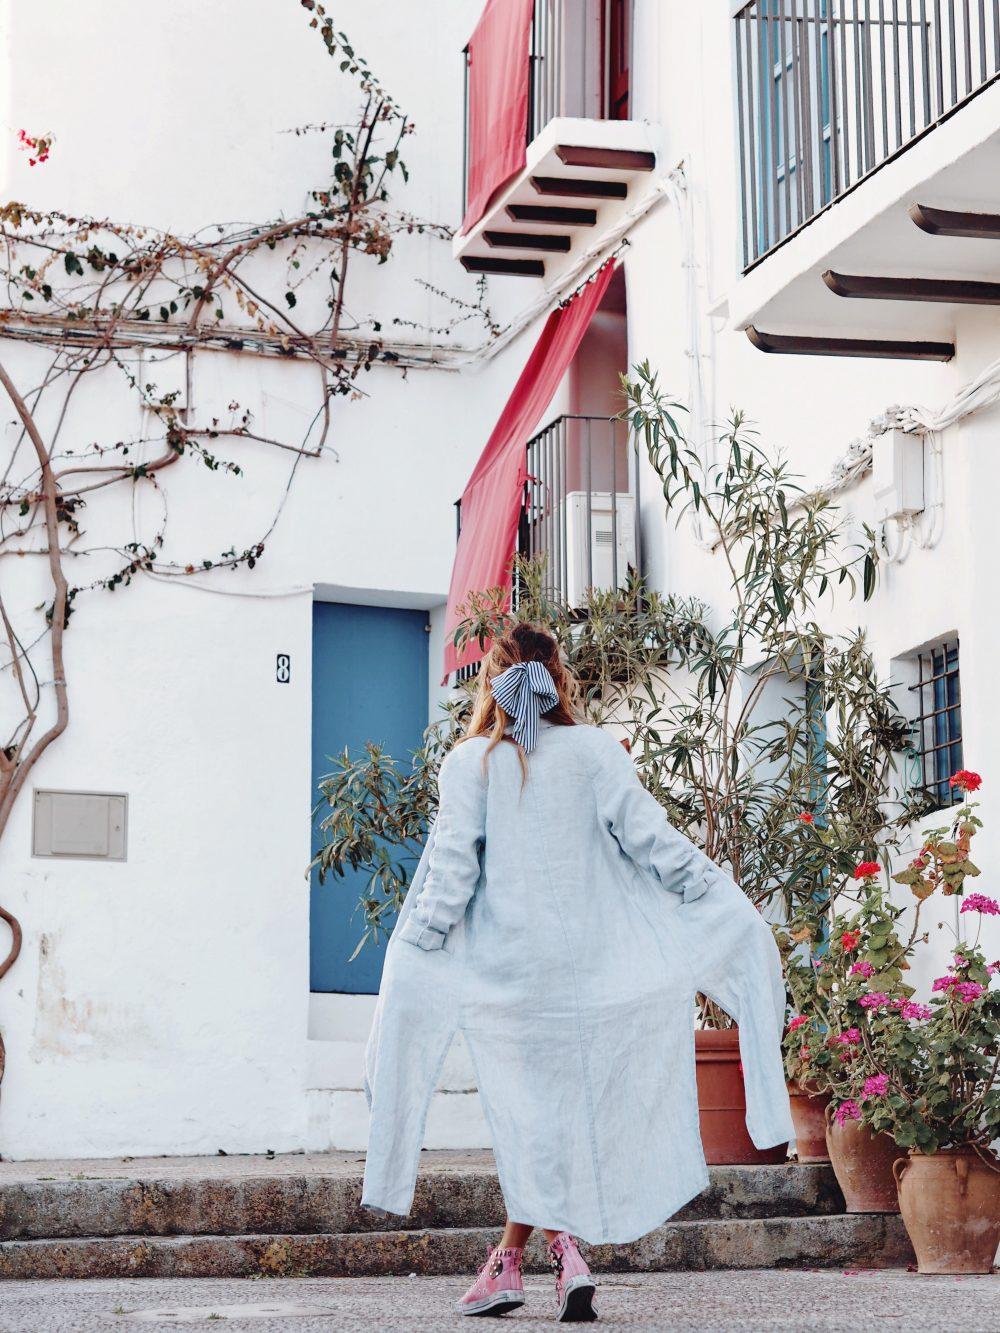 Whitney's Wonderland UK Top Fashion Blogger wears mango linen coat and pink converse in Dalt Vila, Ibiza